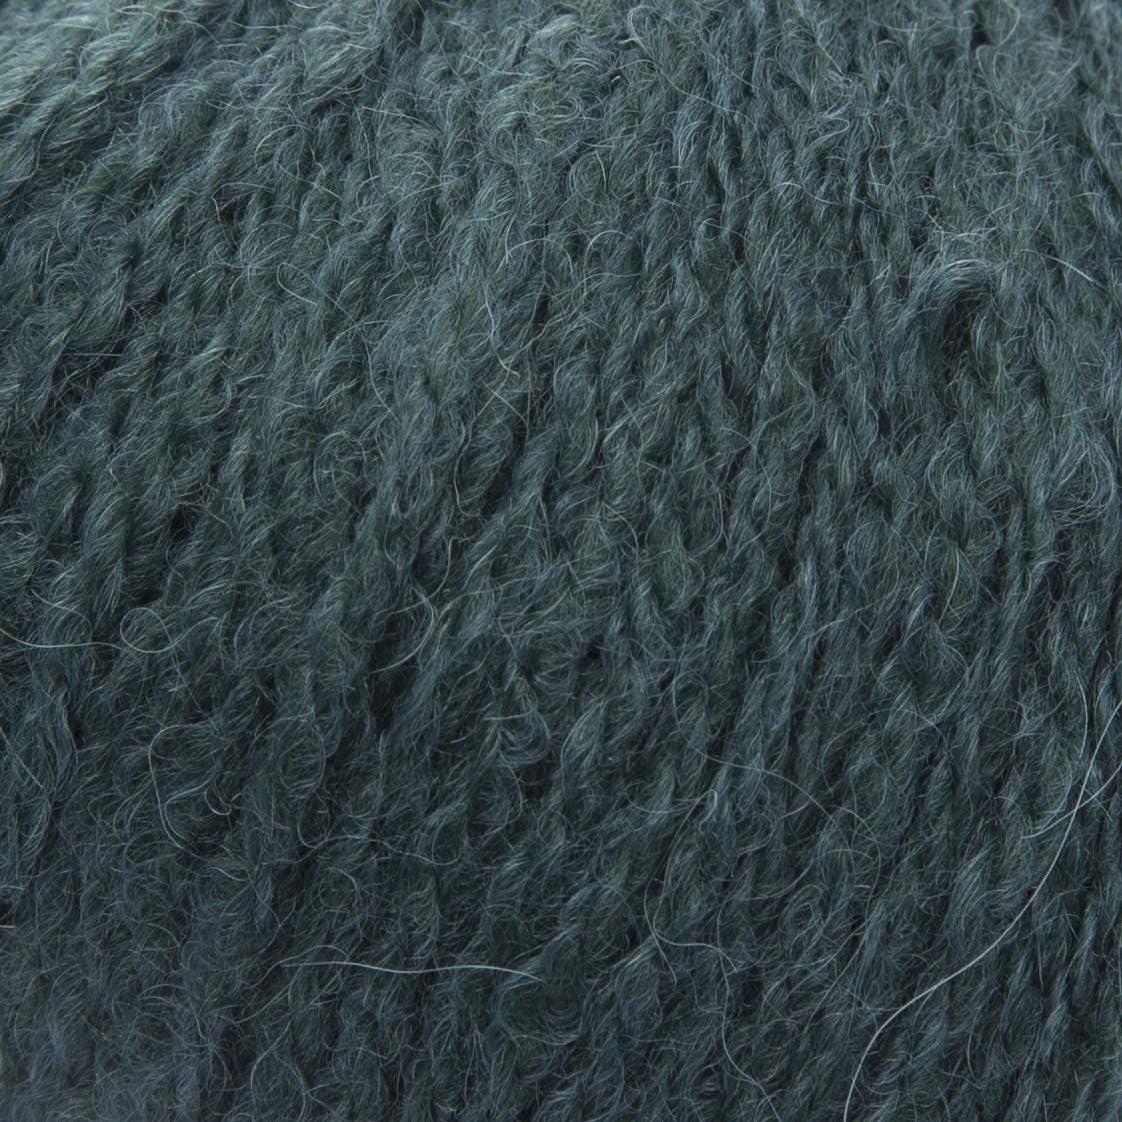 Alpaka Mischung ggh Cumba Wollwei/ß 150m Stricken Nadelst/ärke 3-4 h/äkeln Laufl/änge ca 001 50g Kn/äuel